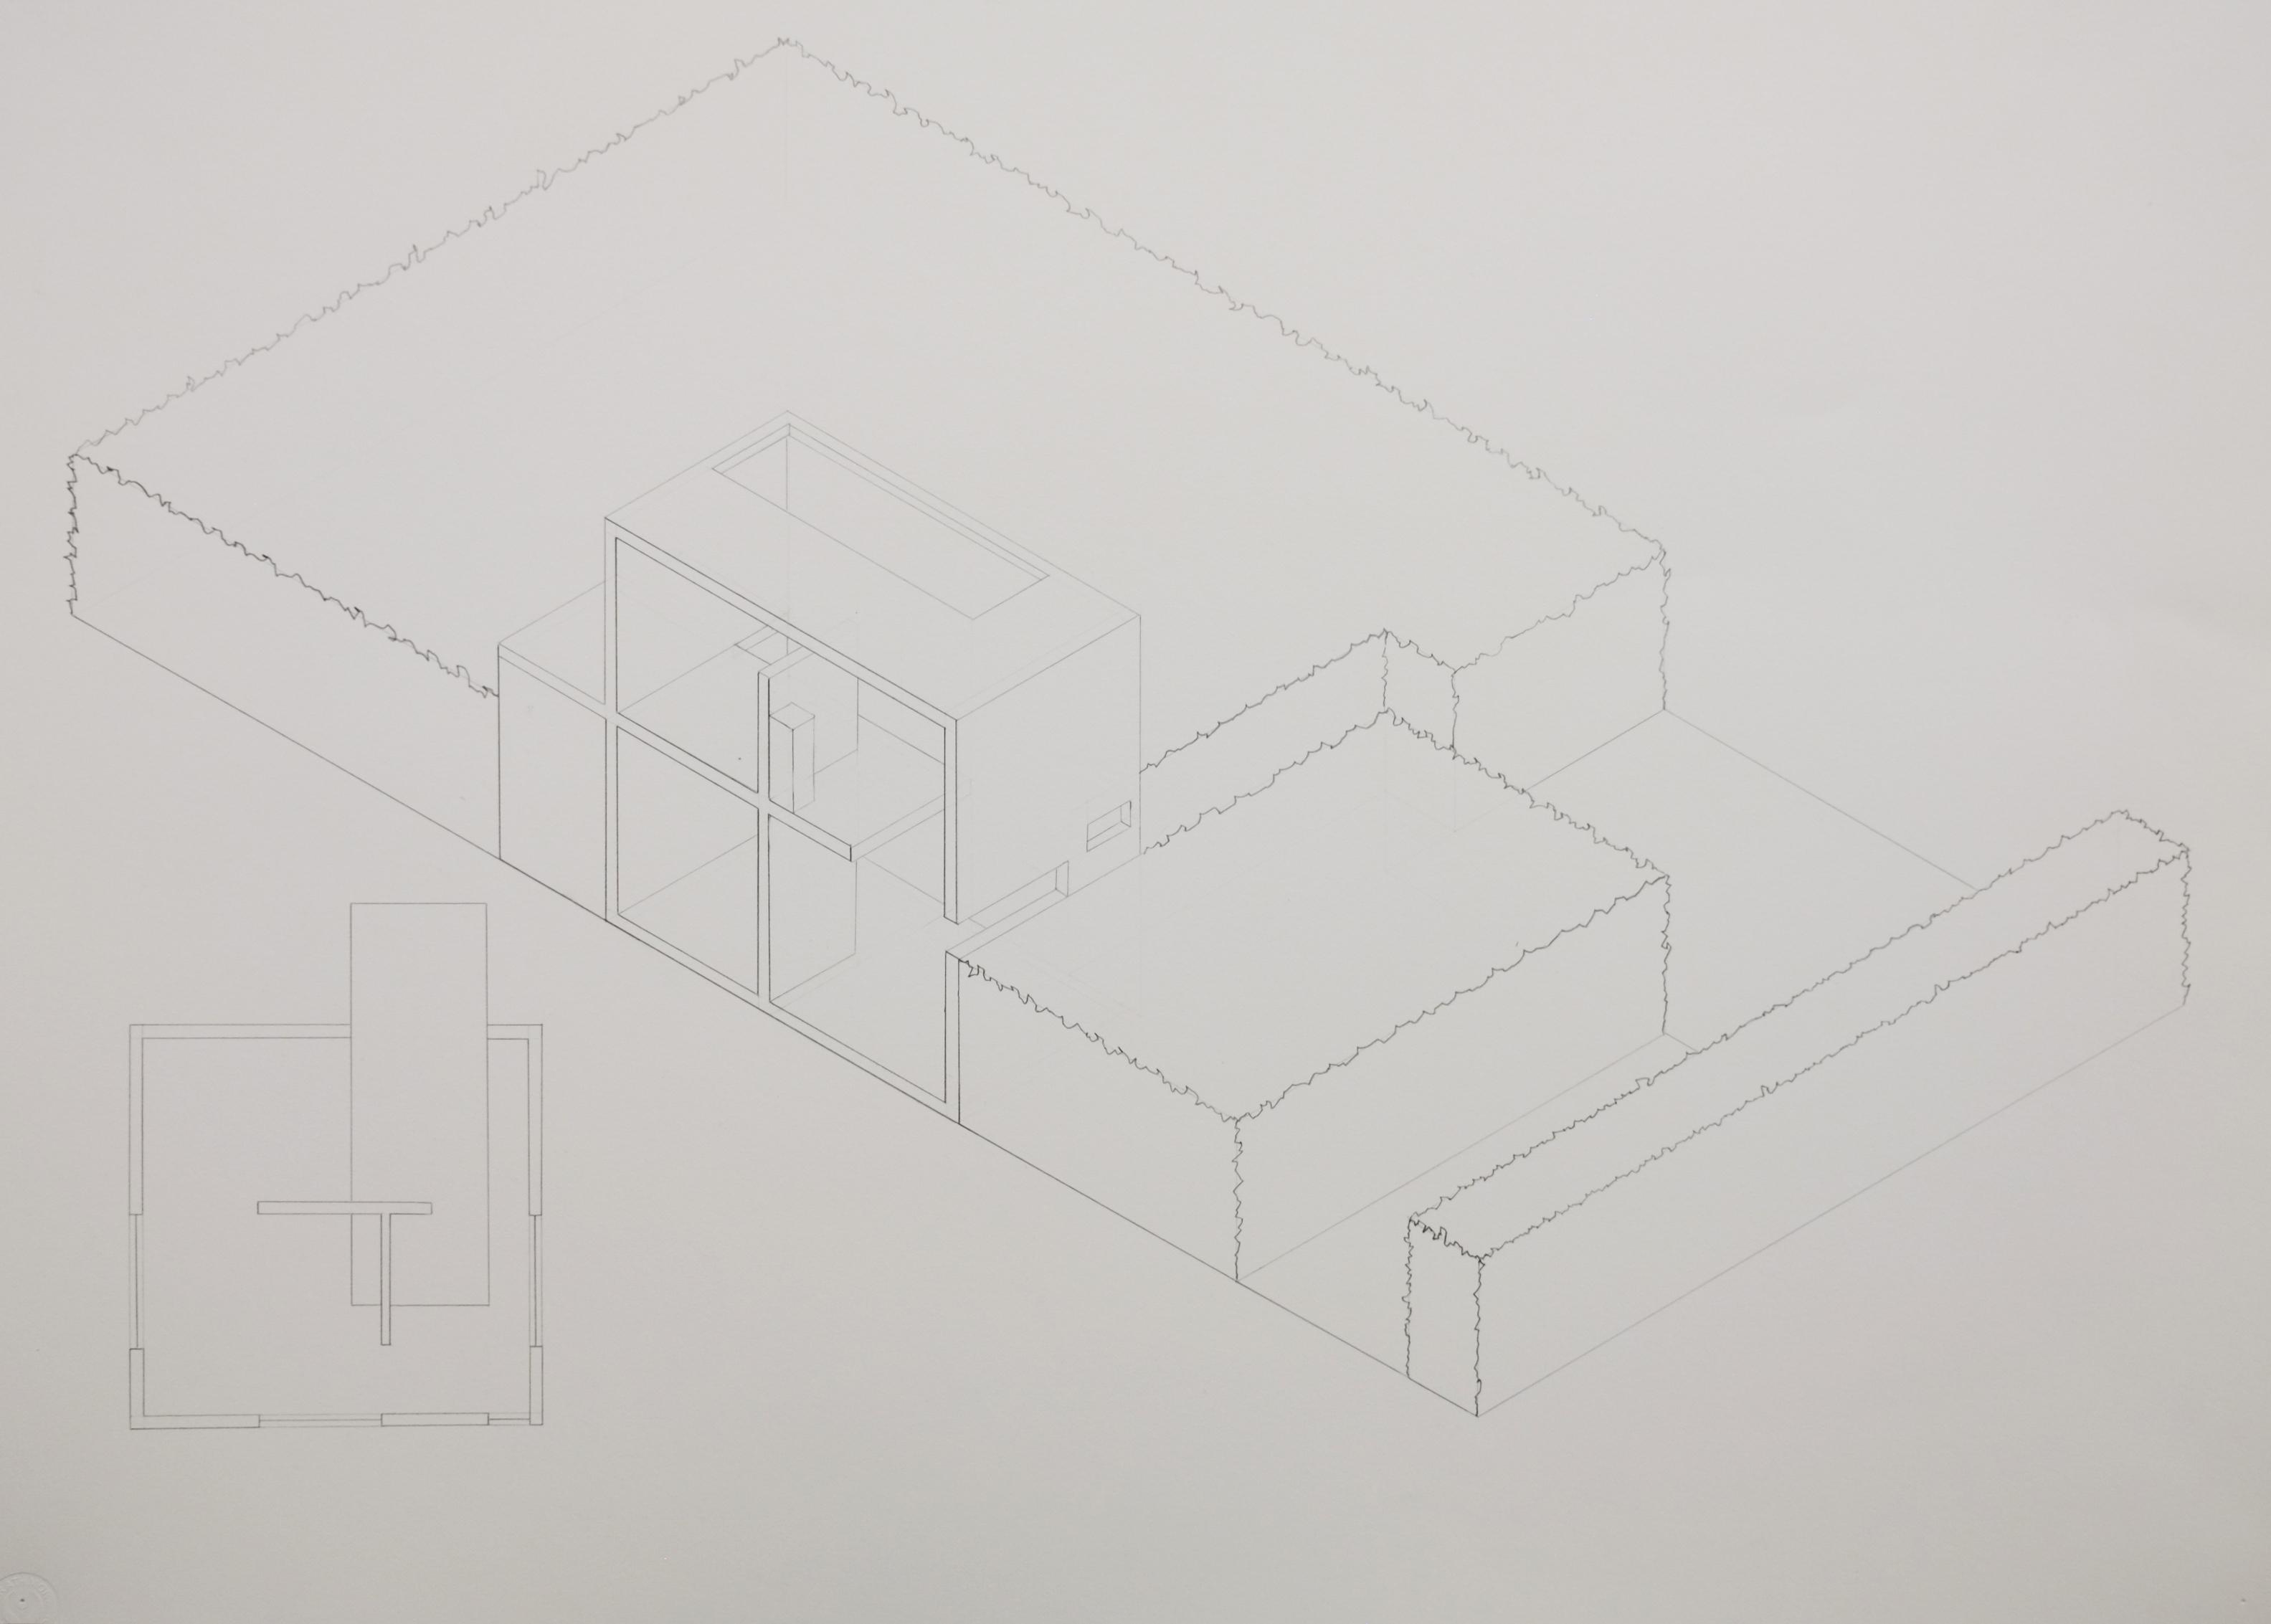 Paraline Drawing